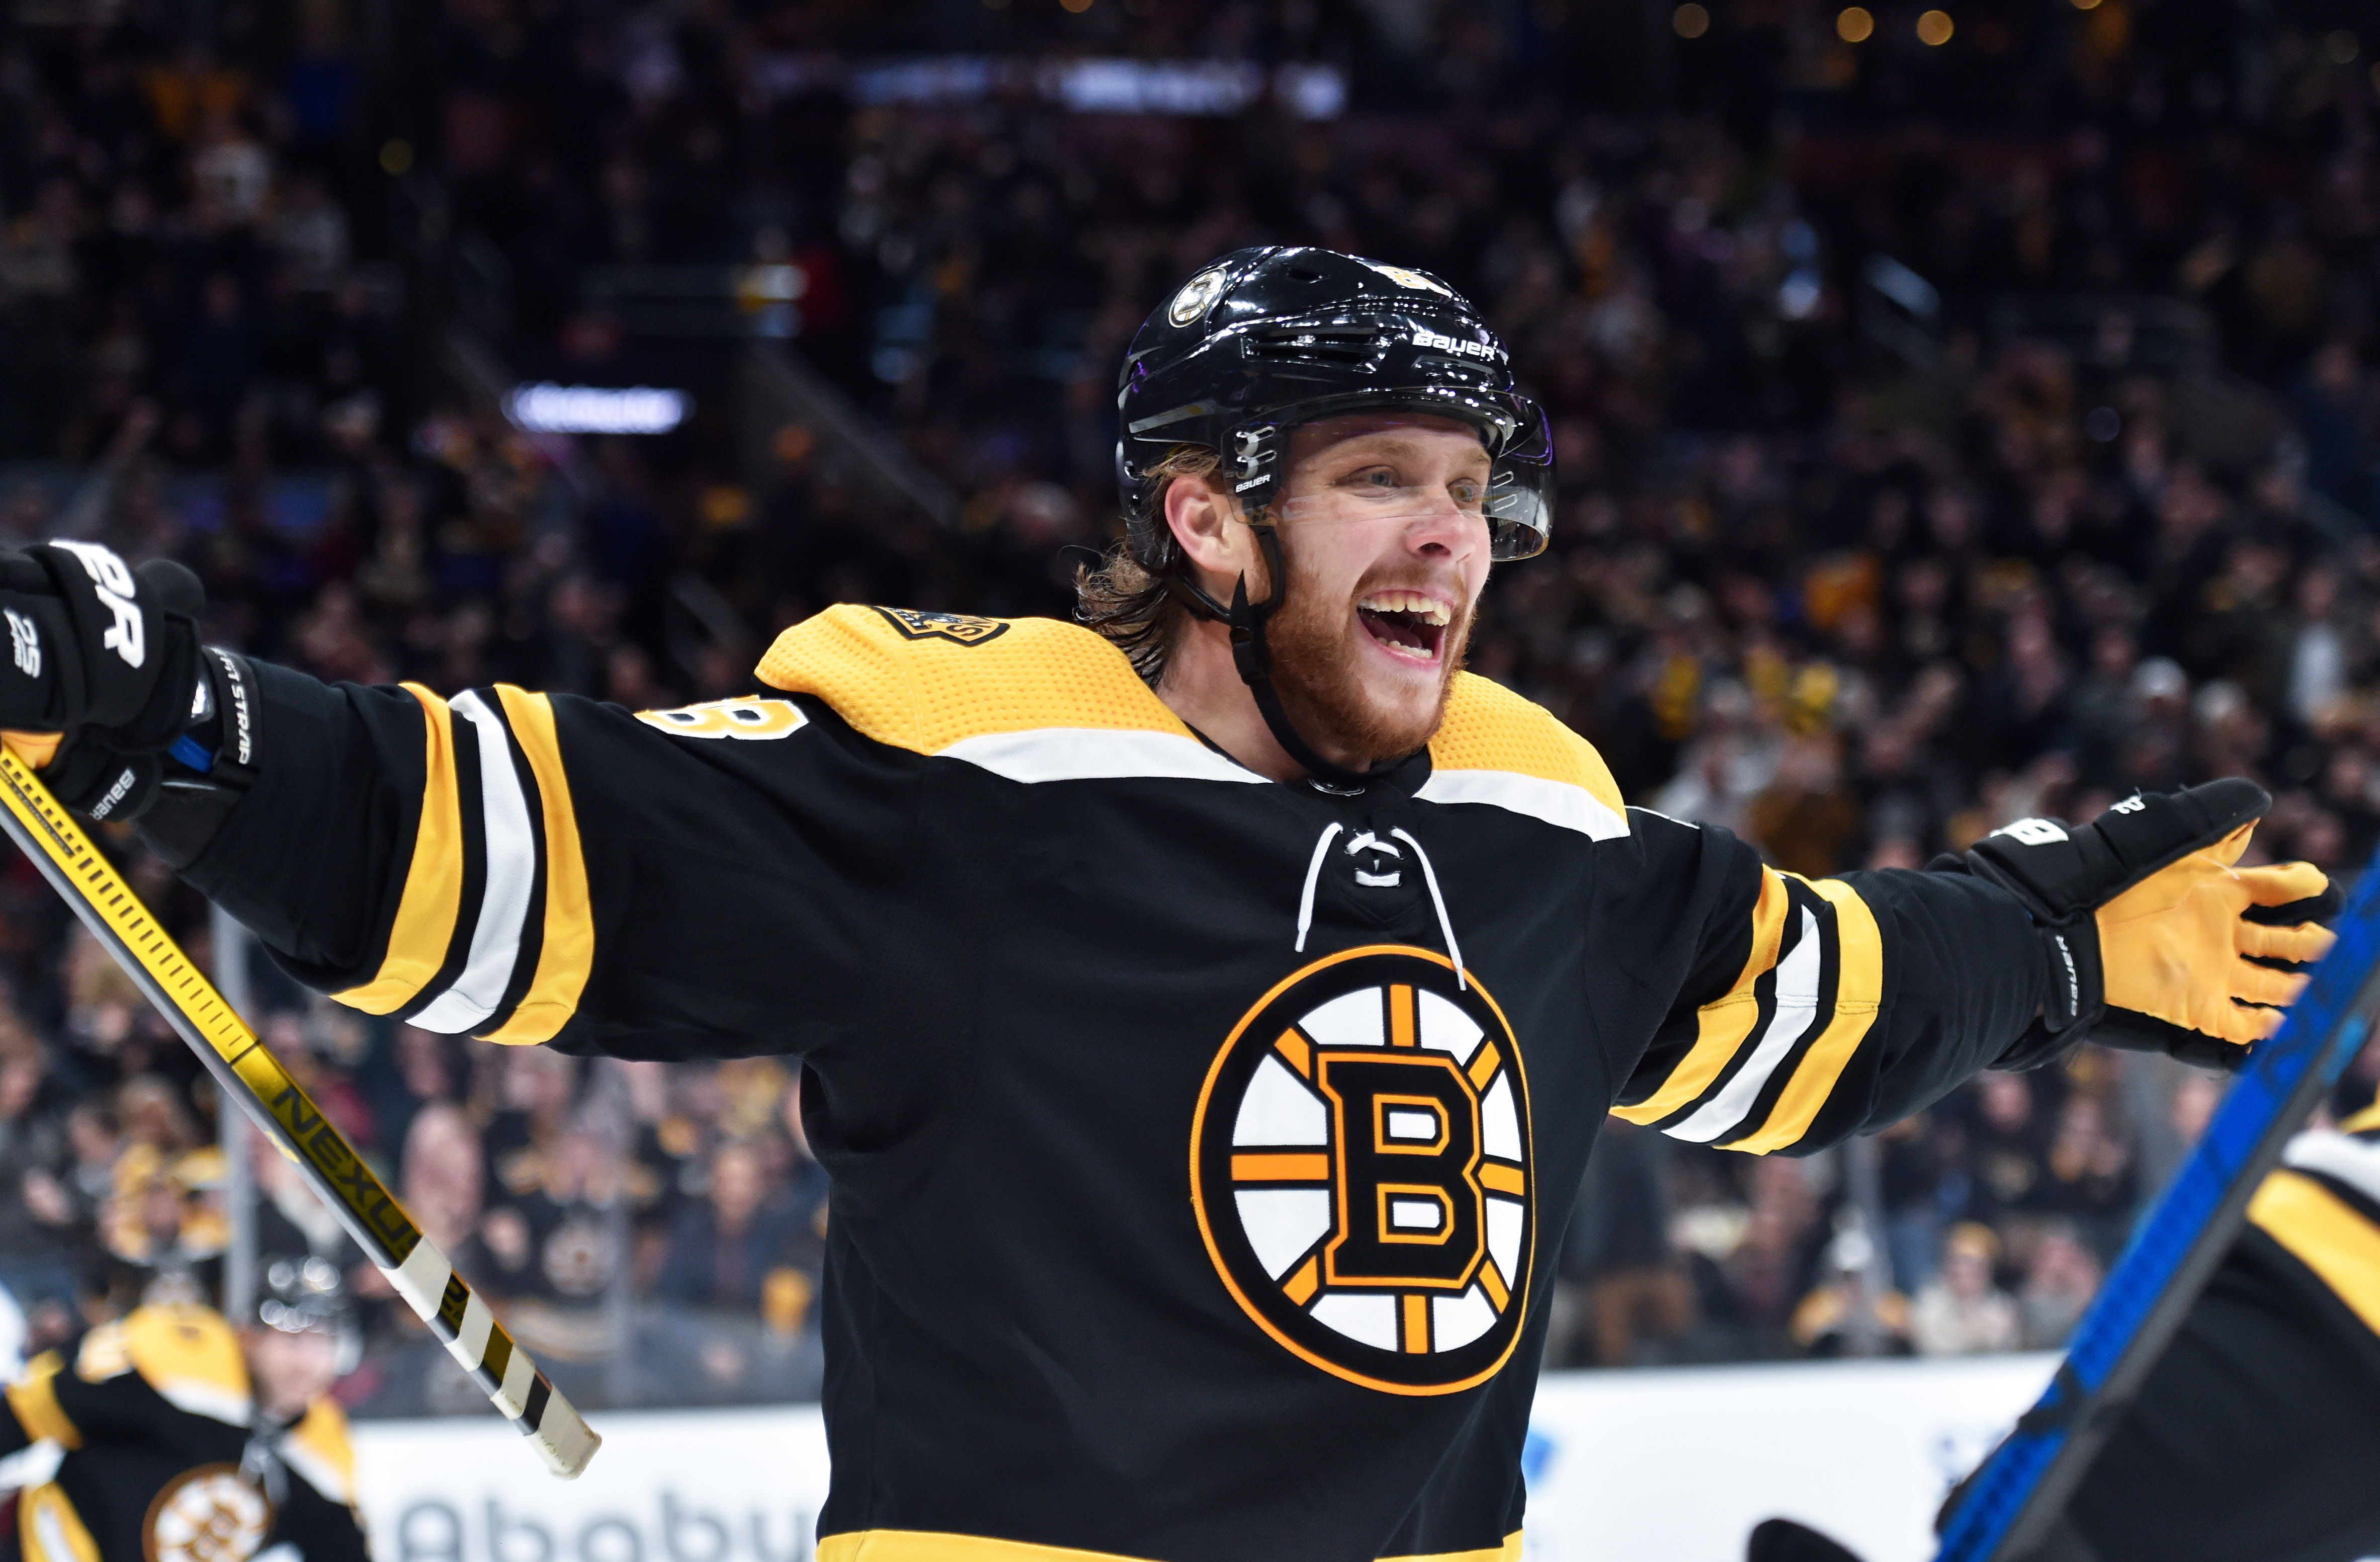 David Pastrnak notches ninth career NHL hat trick